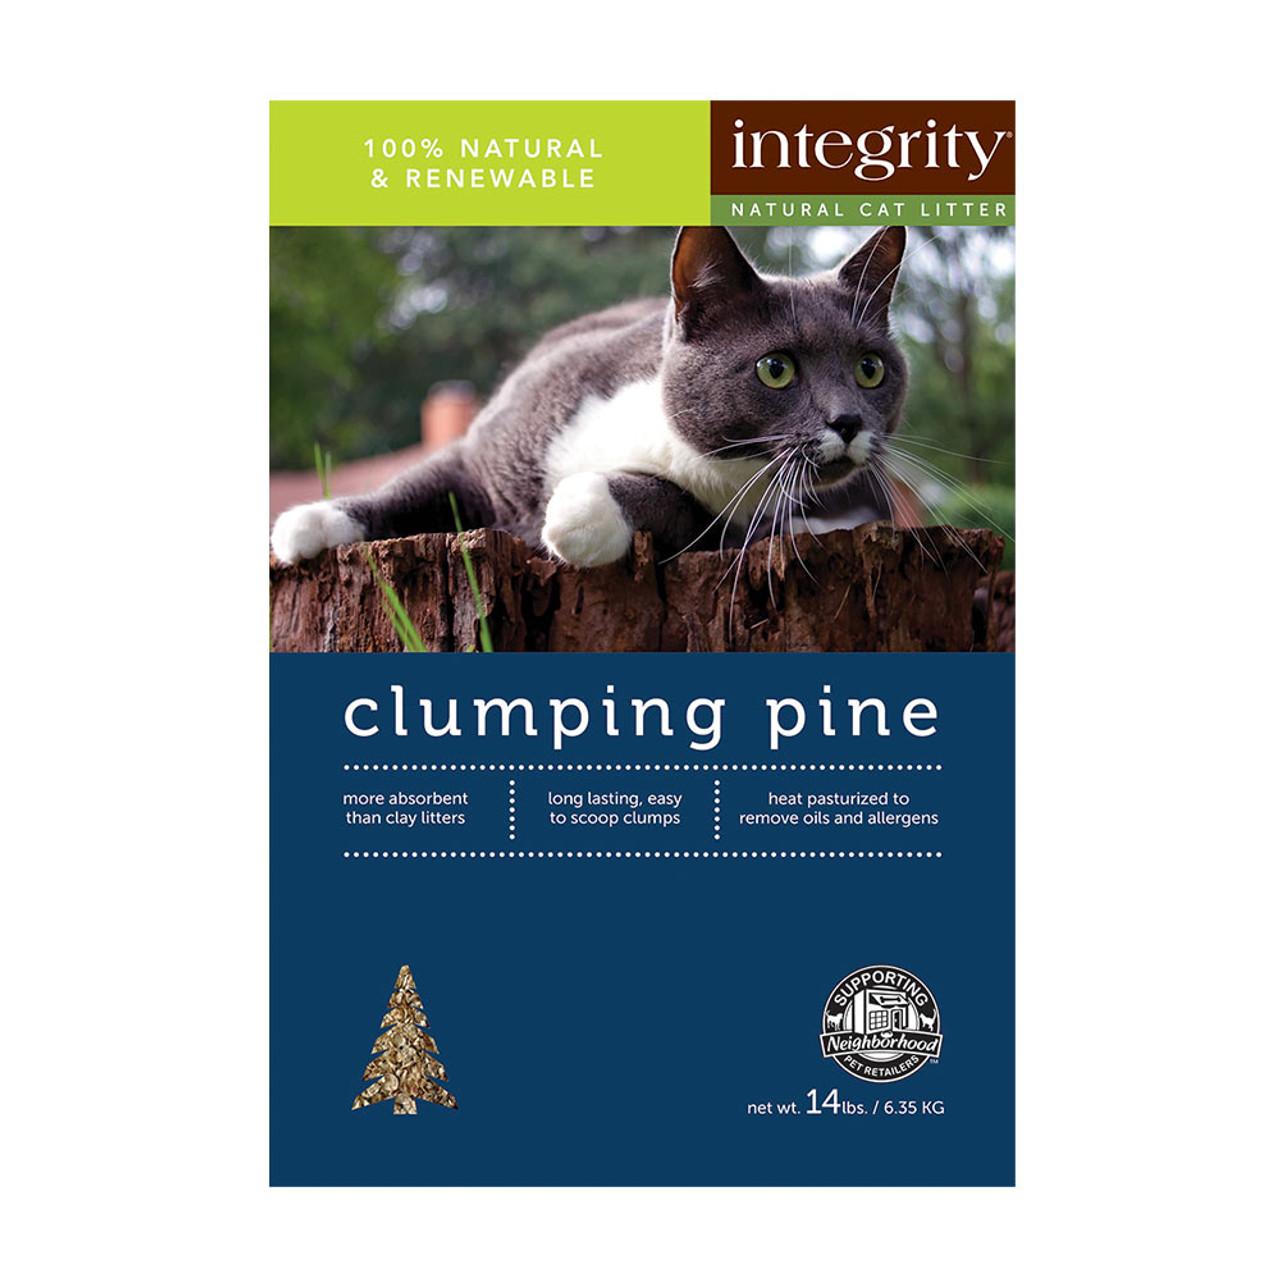 Integrity Clumping Pine Cat Litter